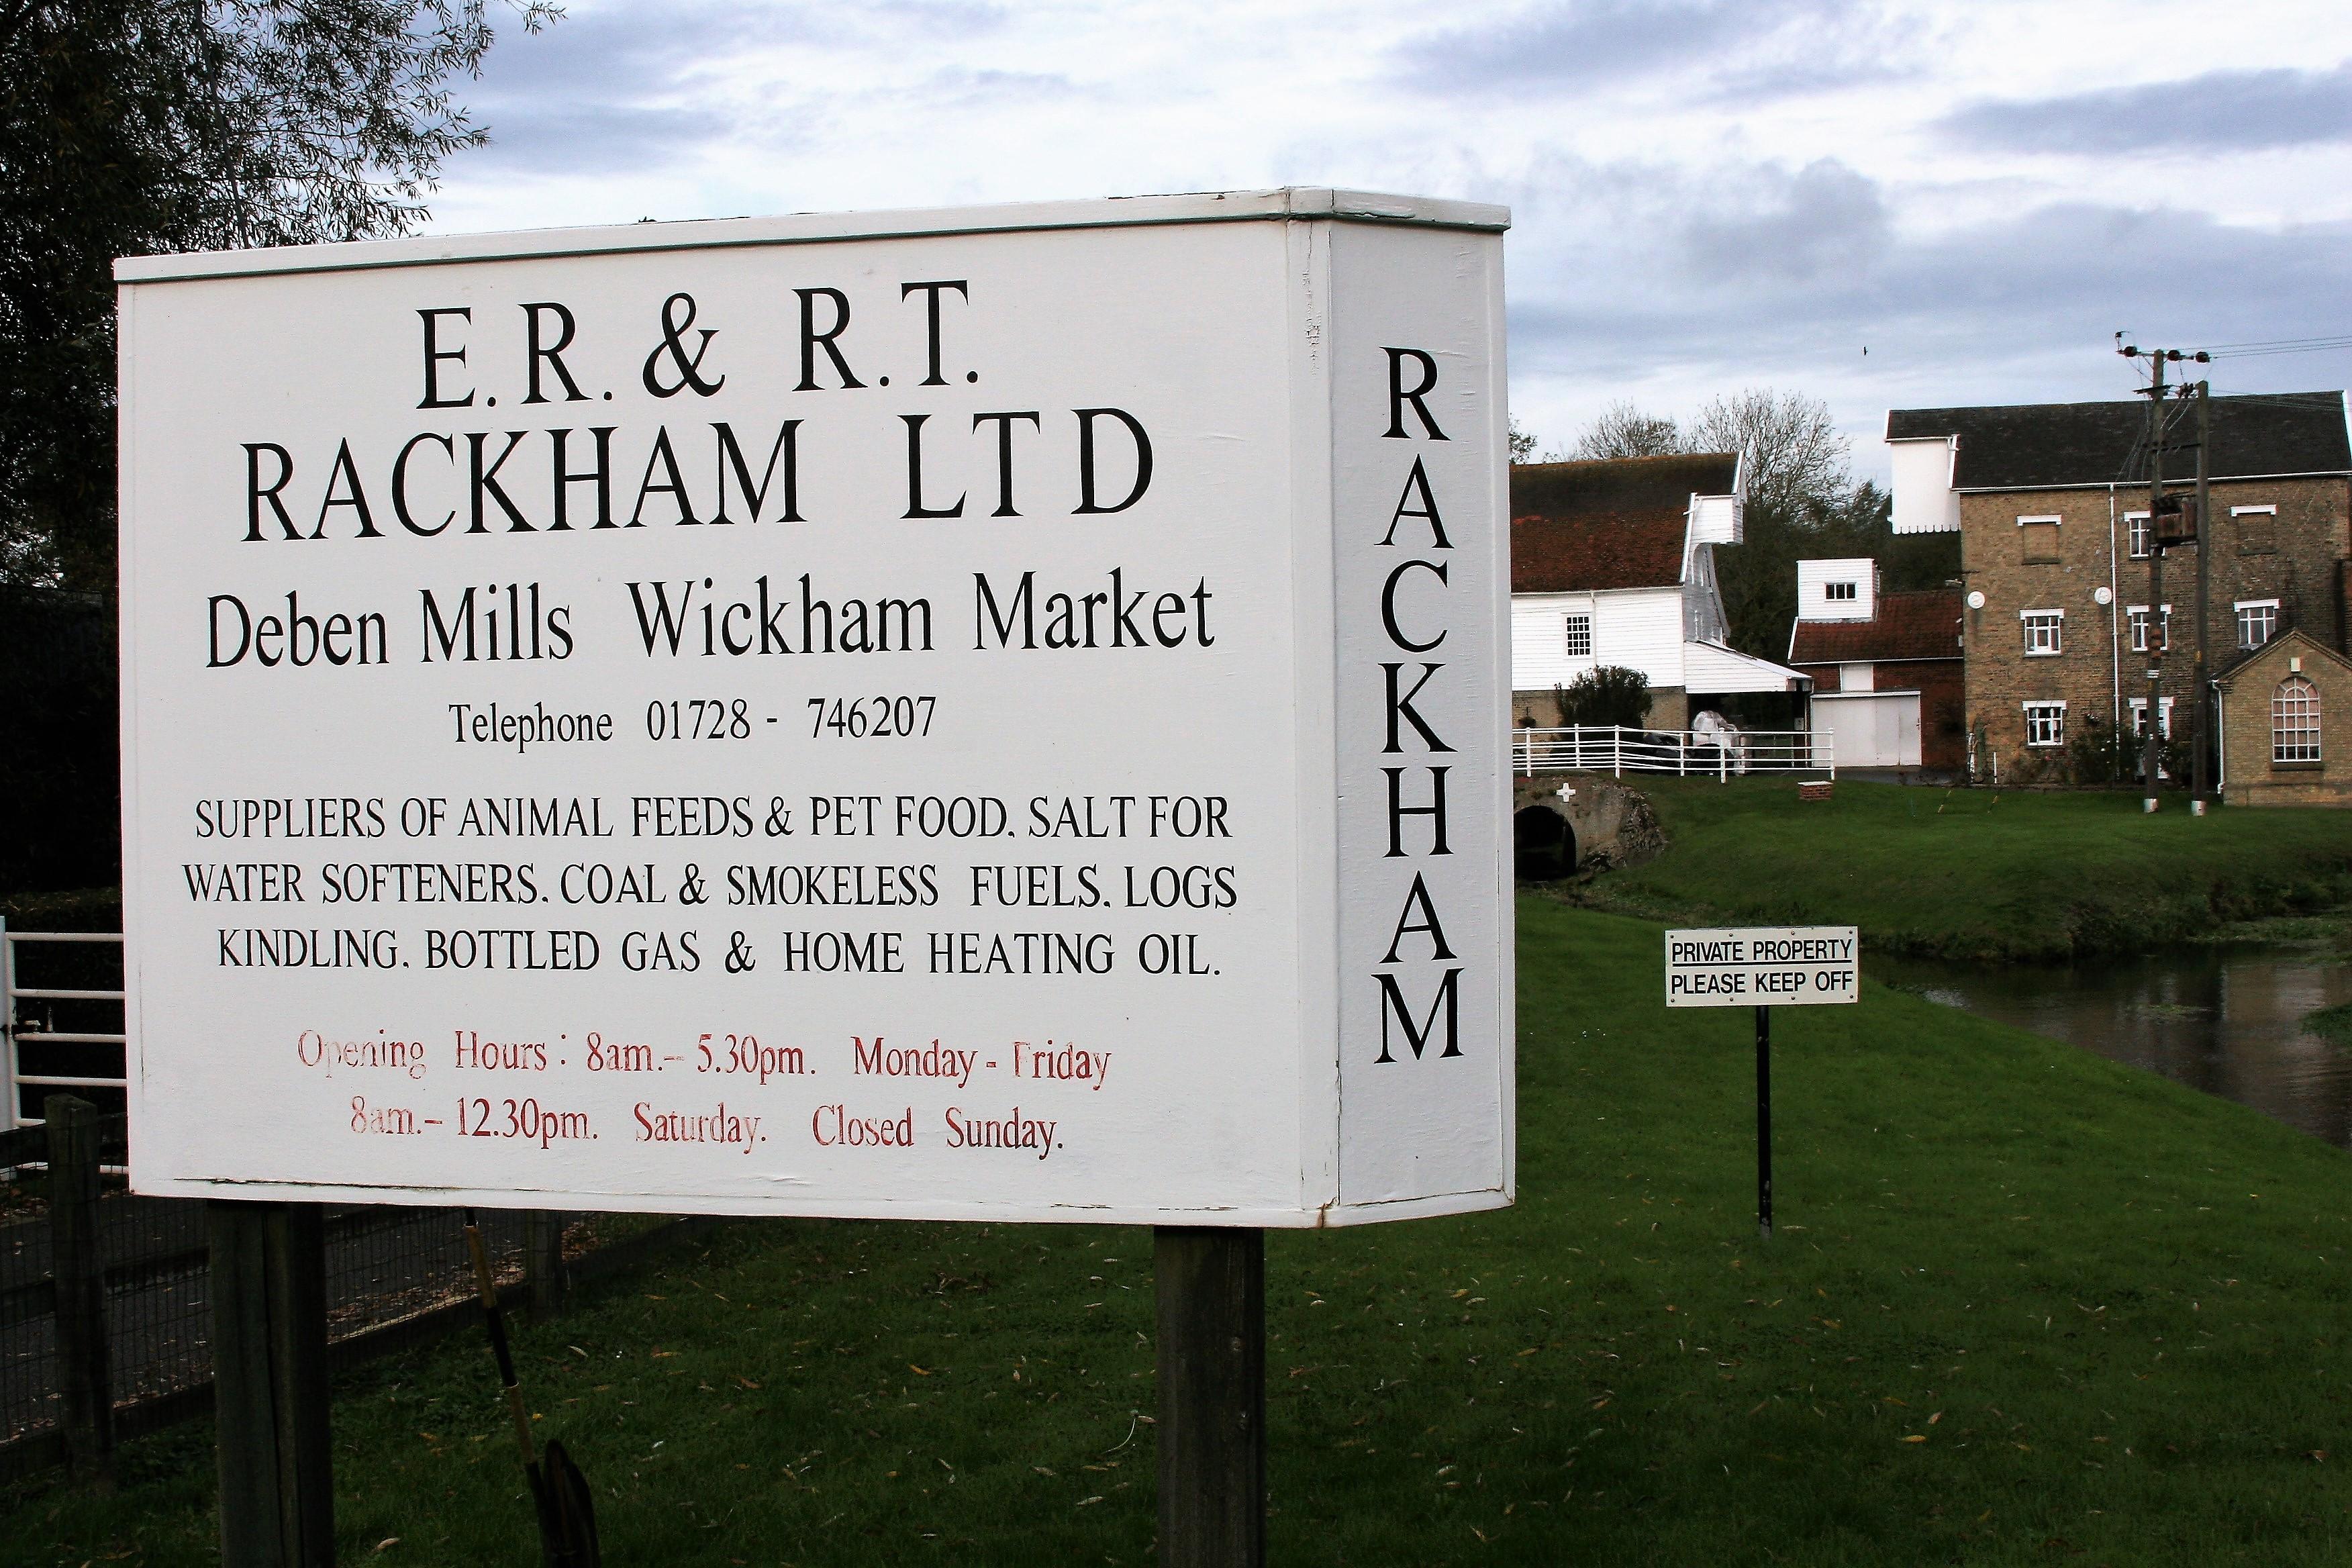 E.R & R.T Rackham Ltd,Wickham Market